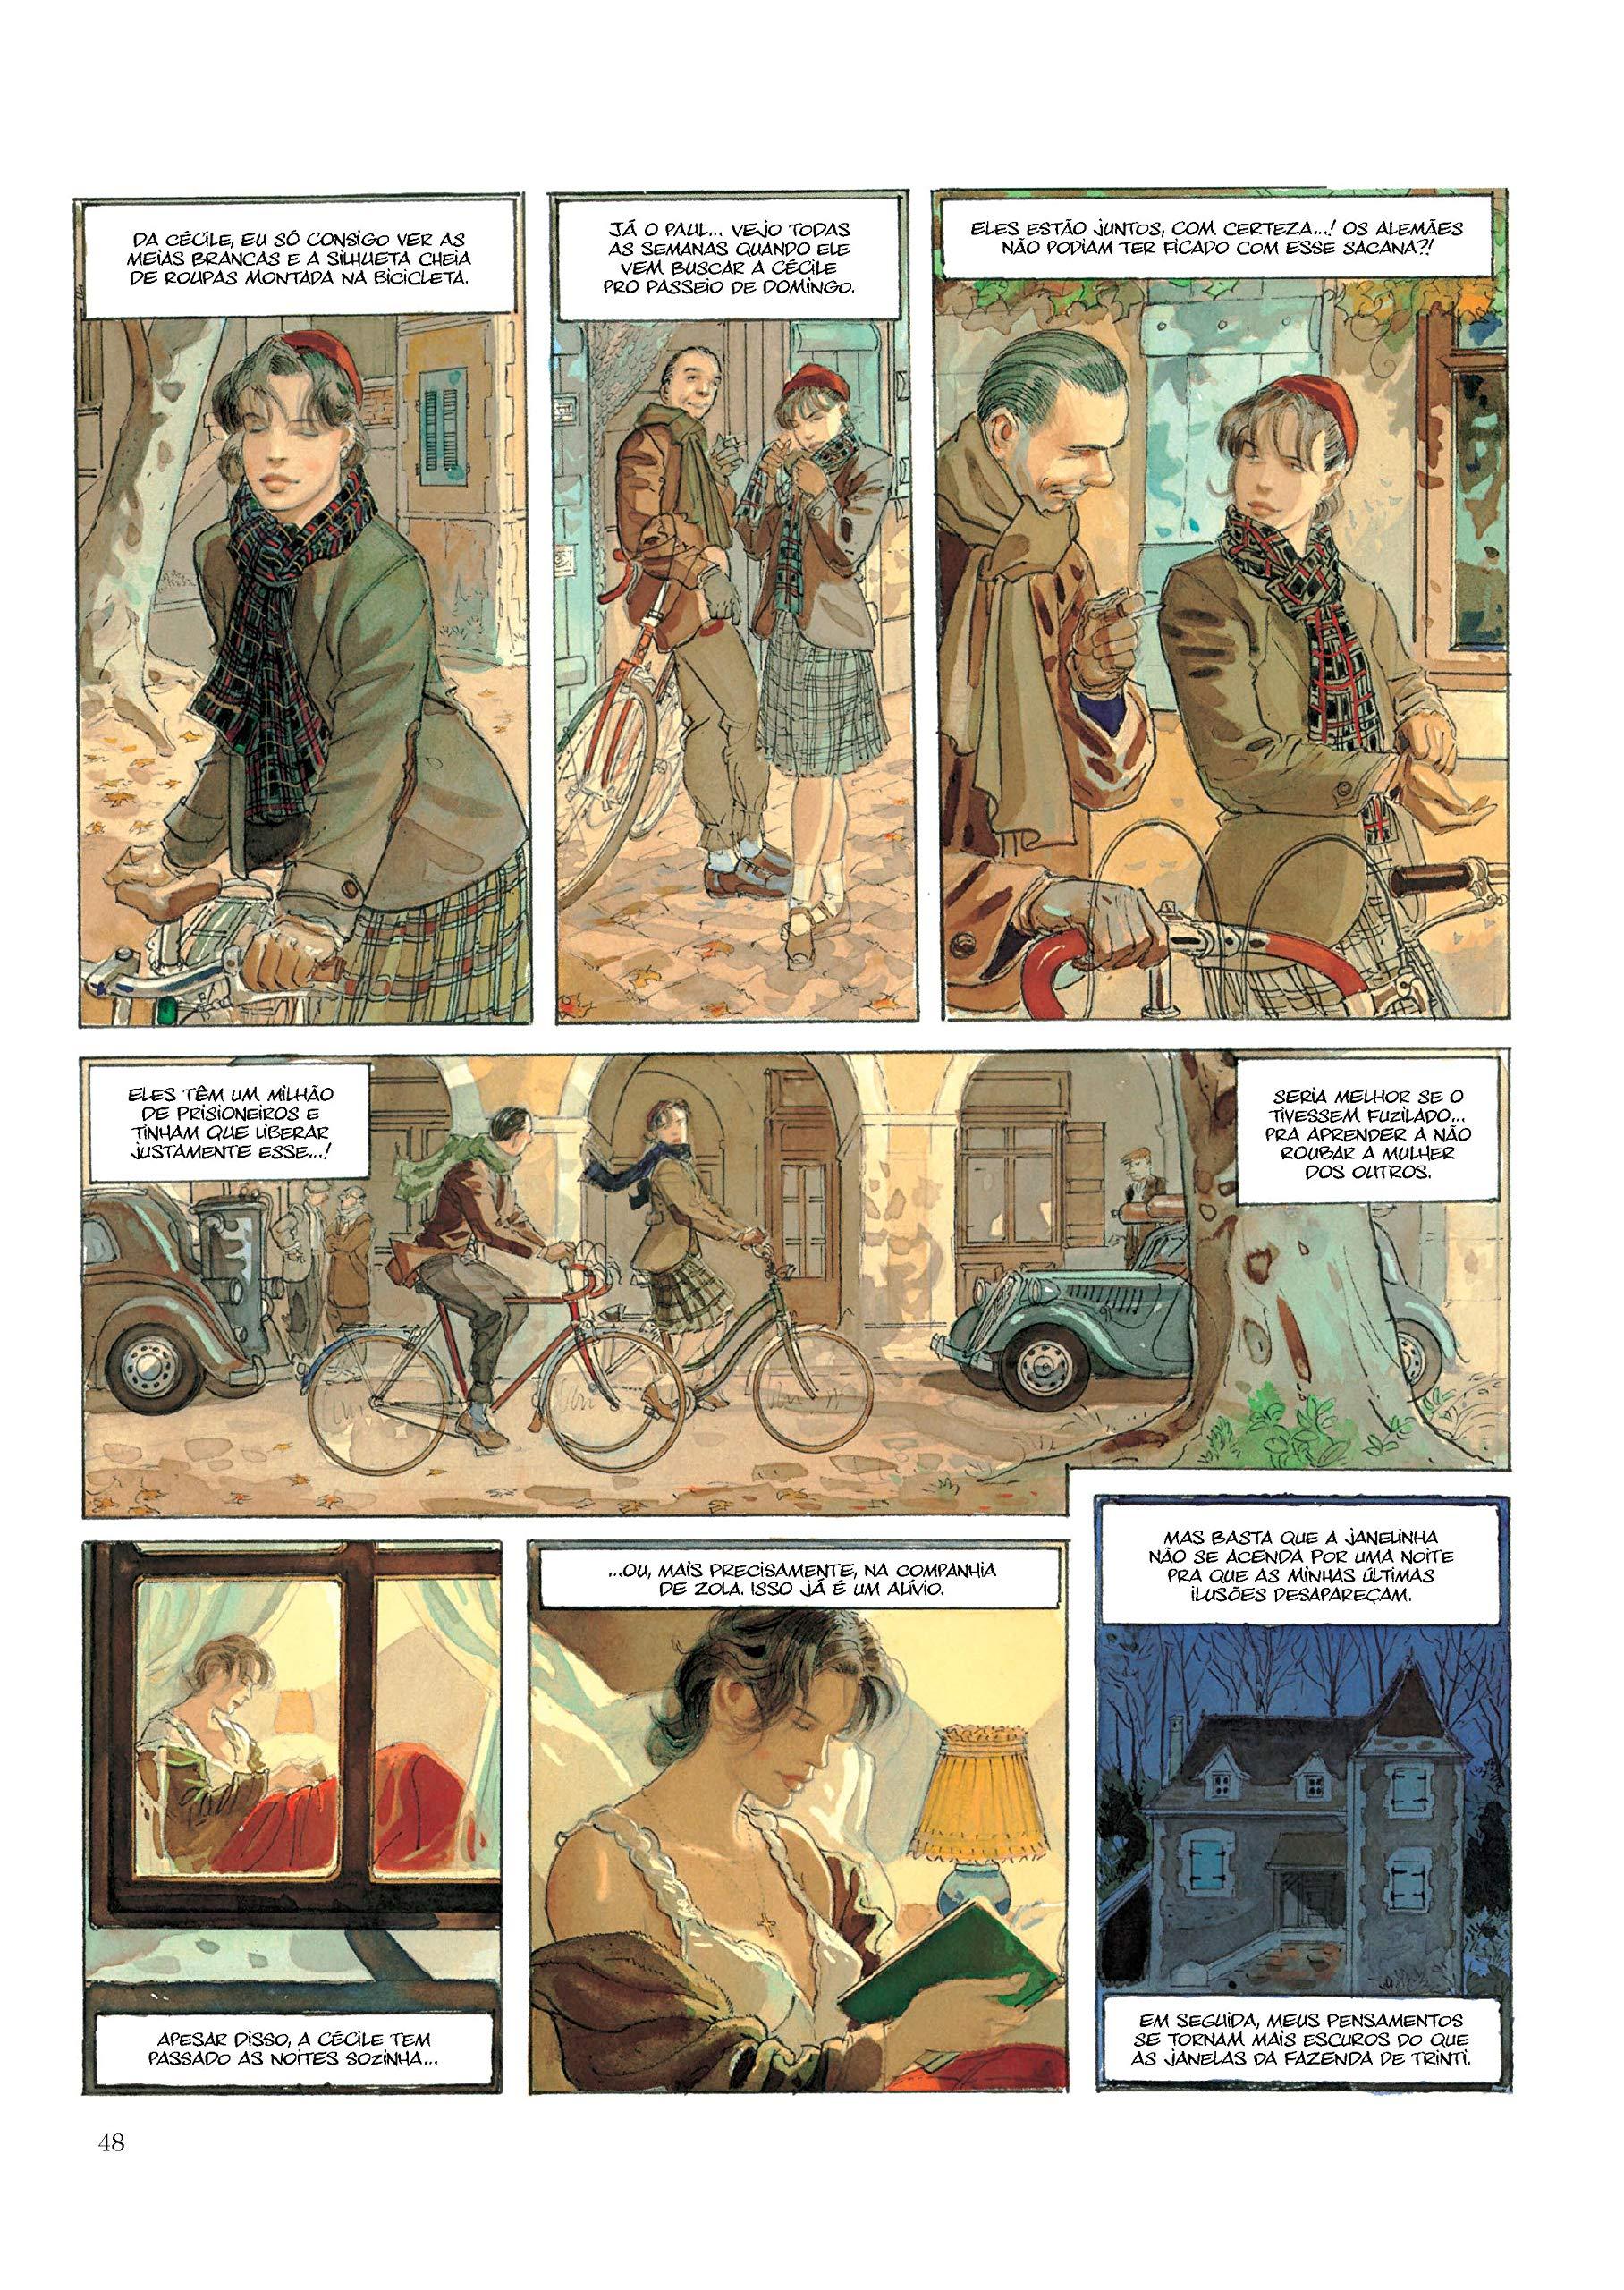 Livro 'Destino Adiado' por Jean-pierre Gibrat